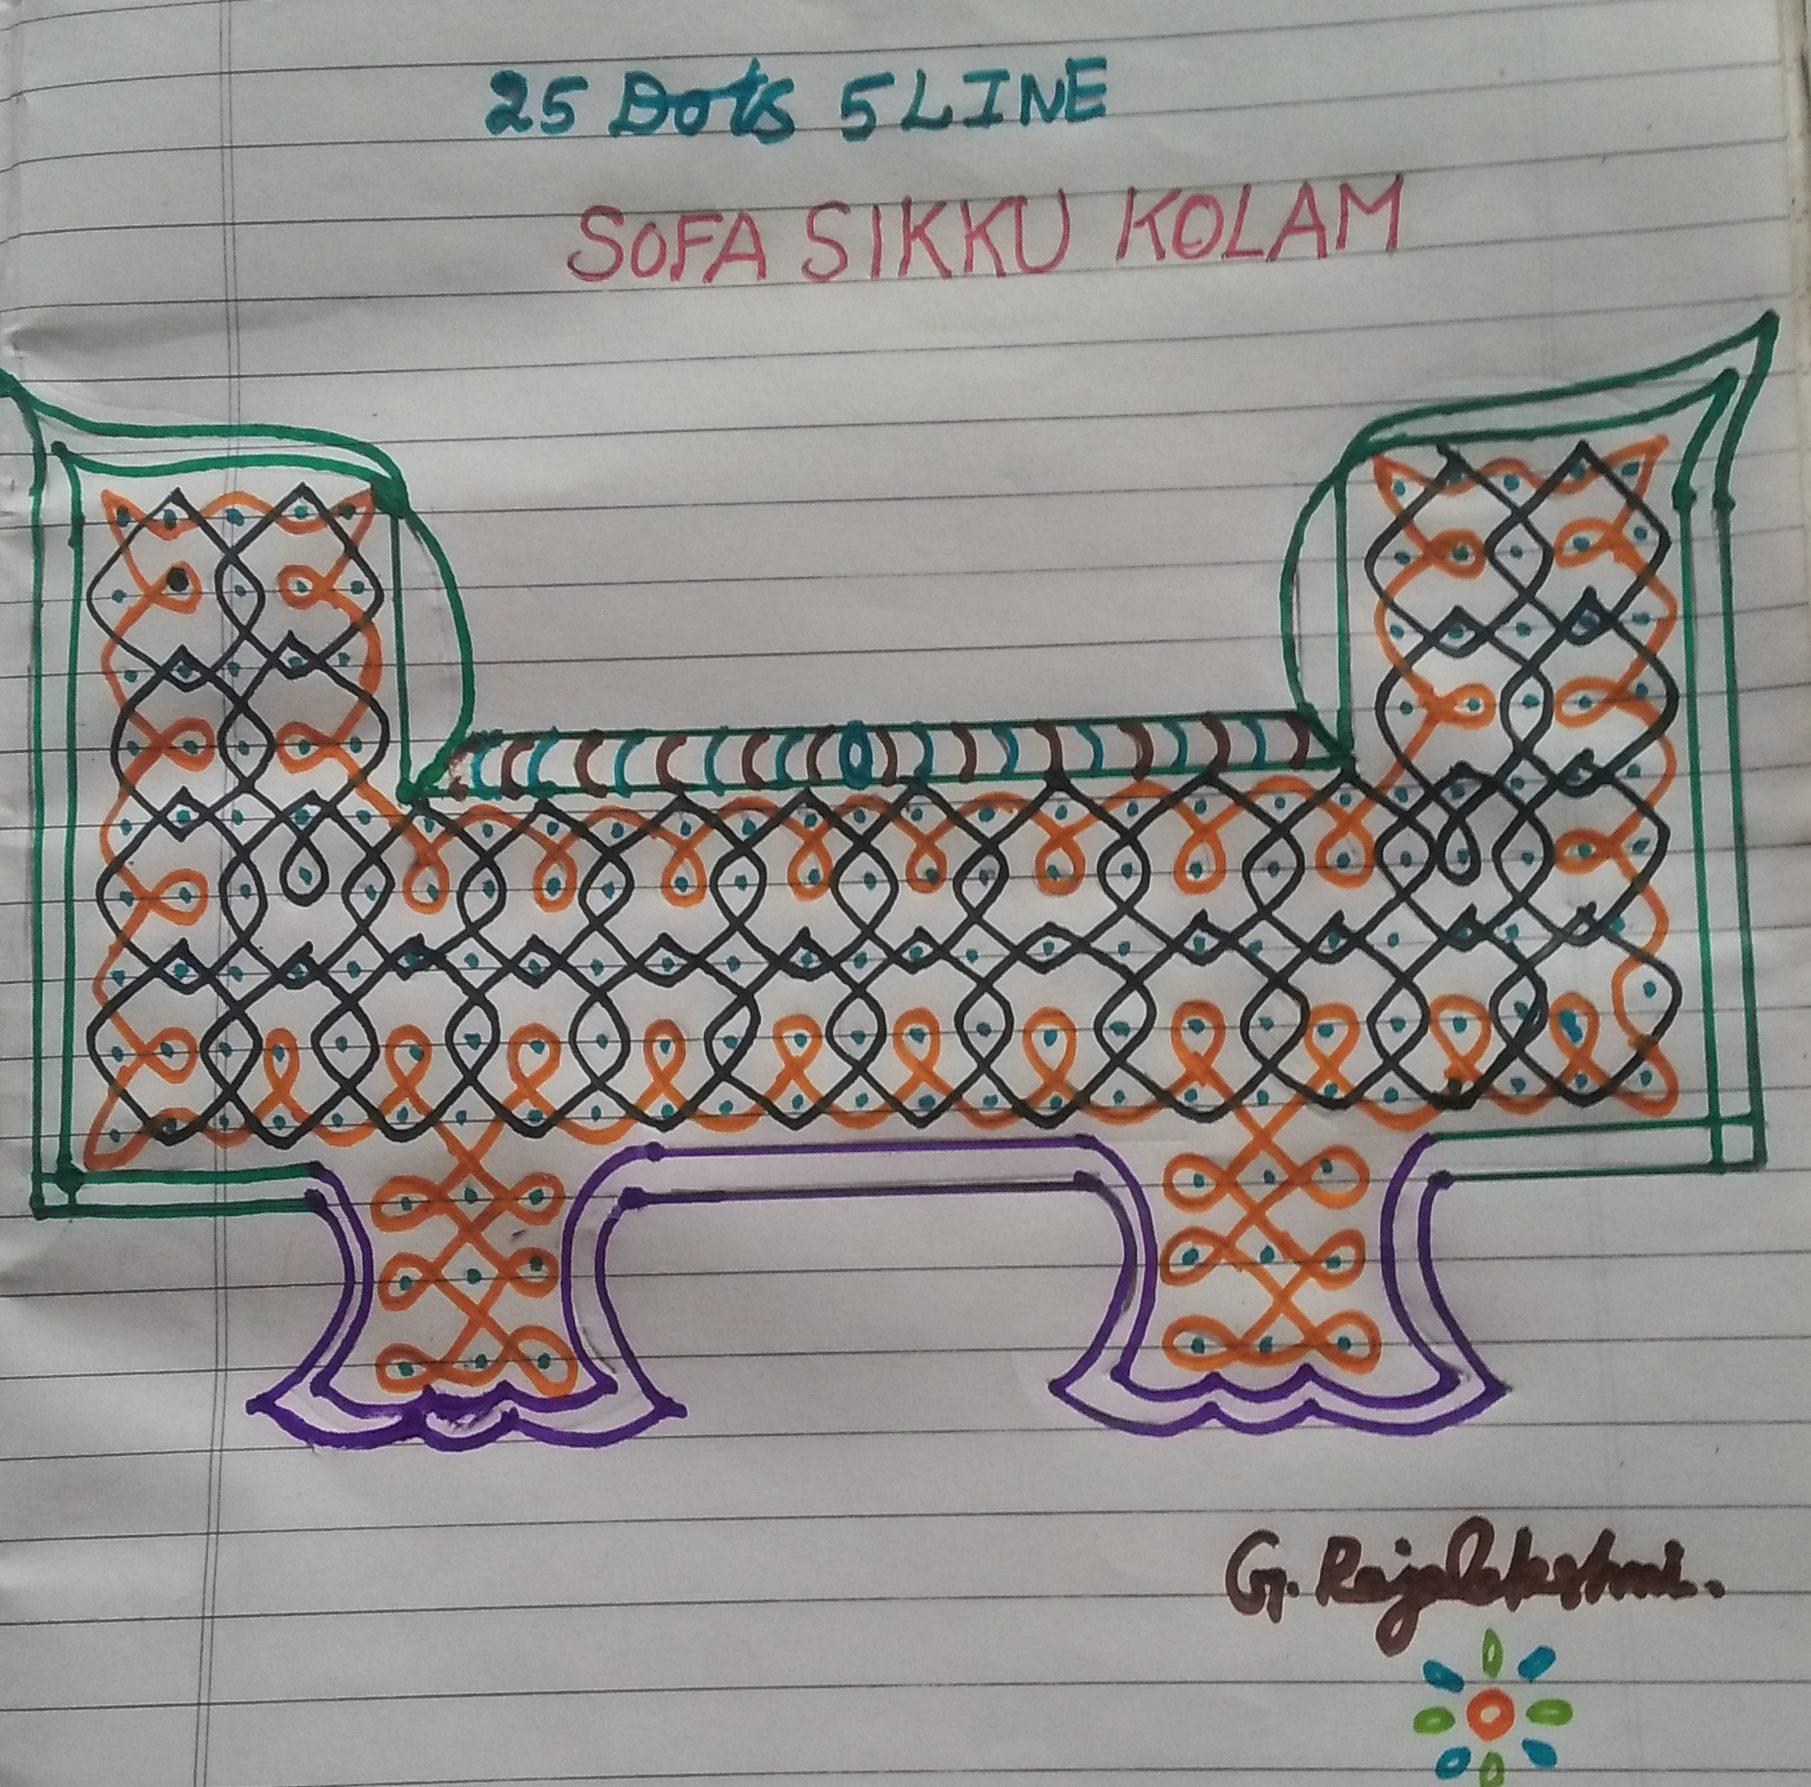 Sikku sofa kolam || 25 dots Kolam